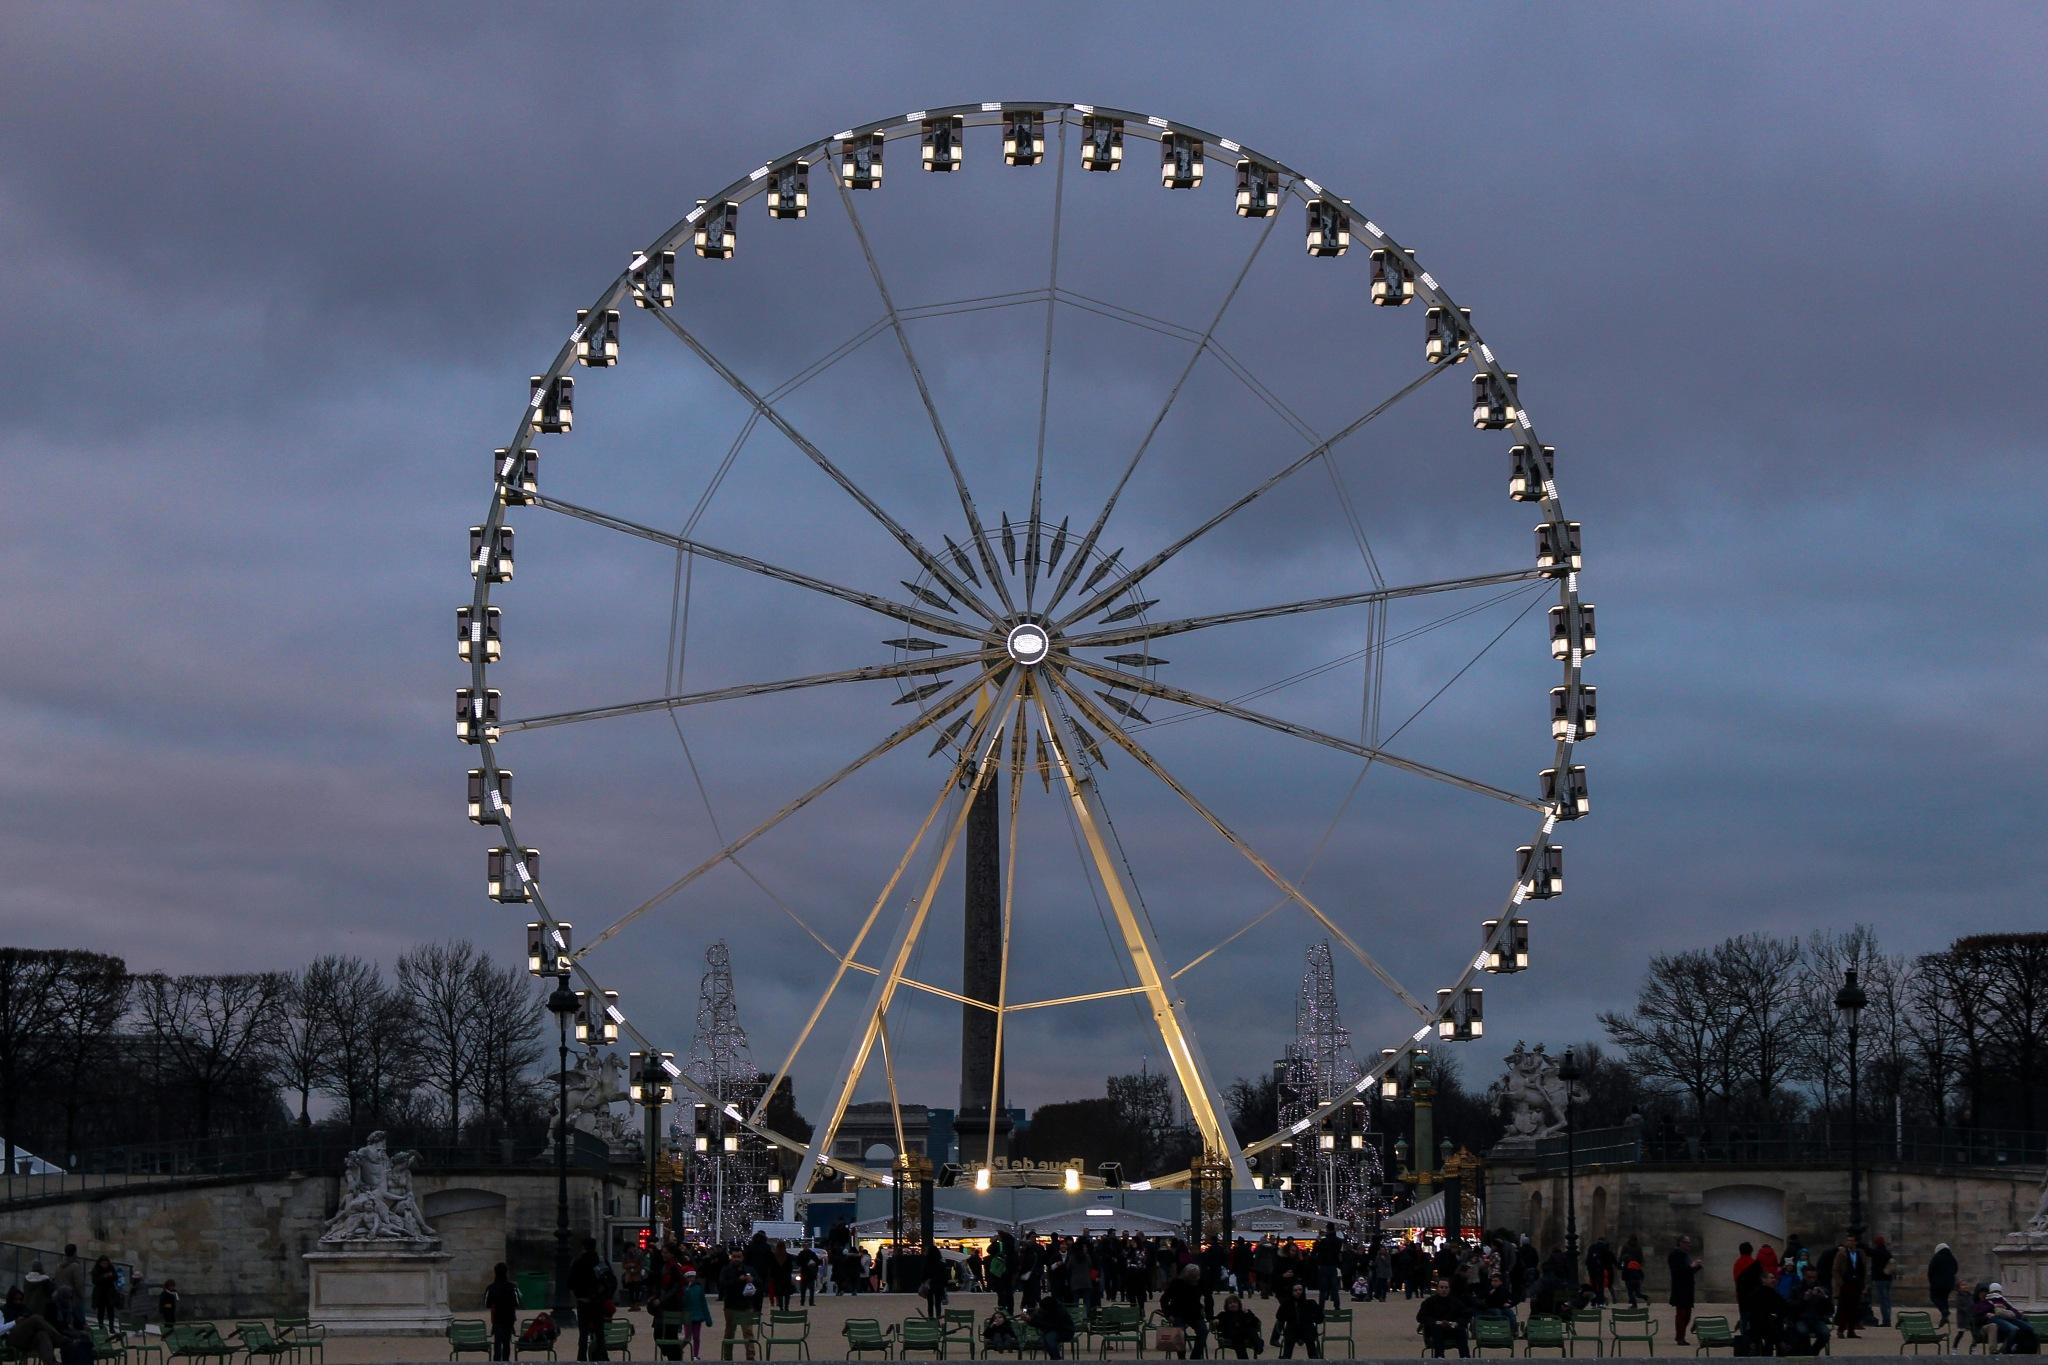 Paris, France by Rafael Puerto